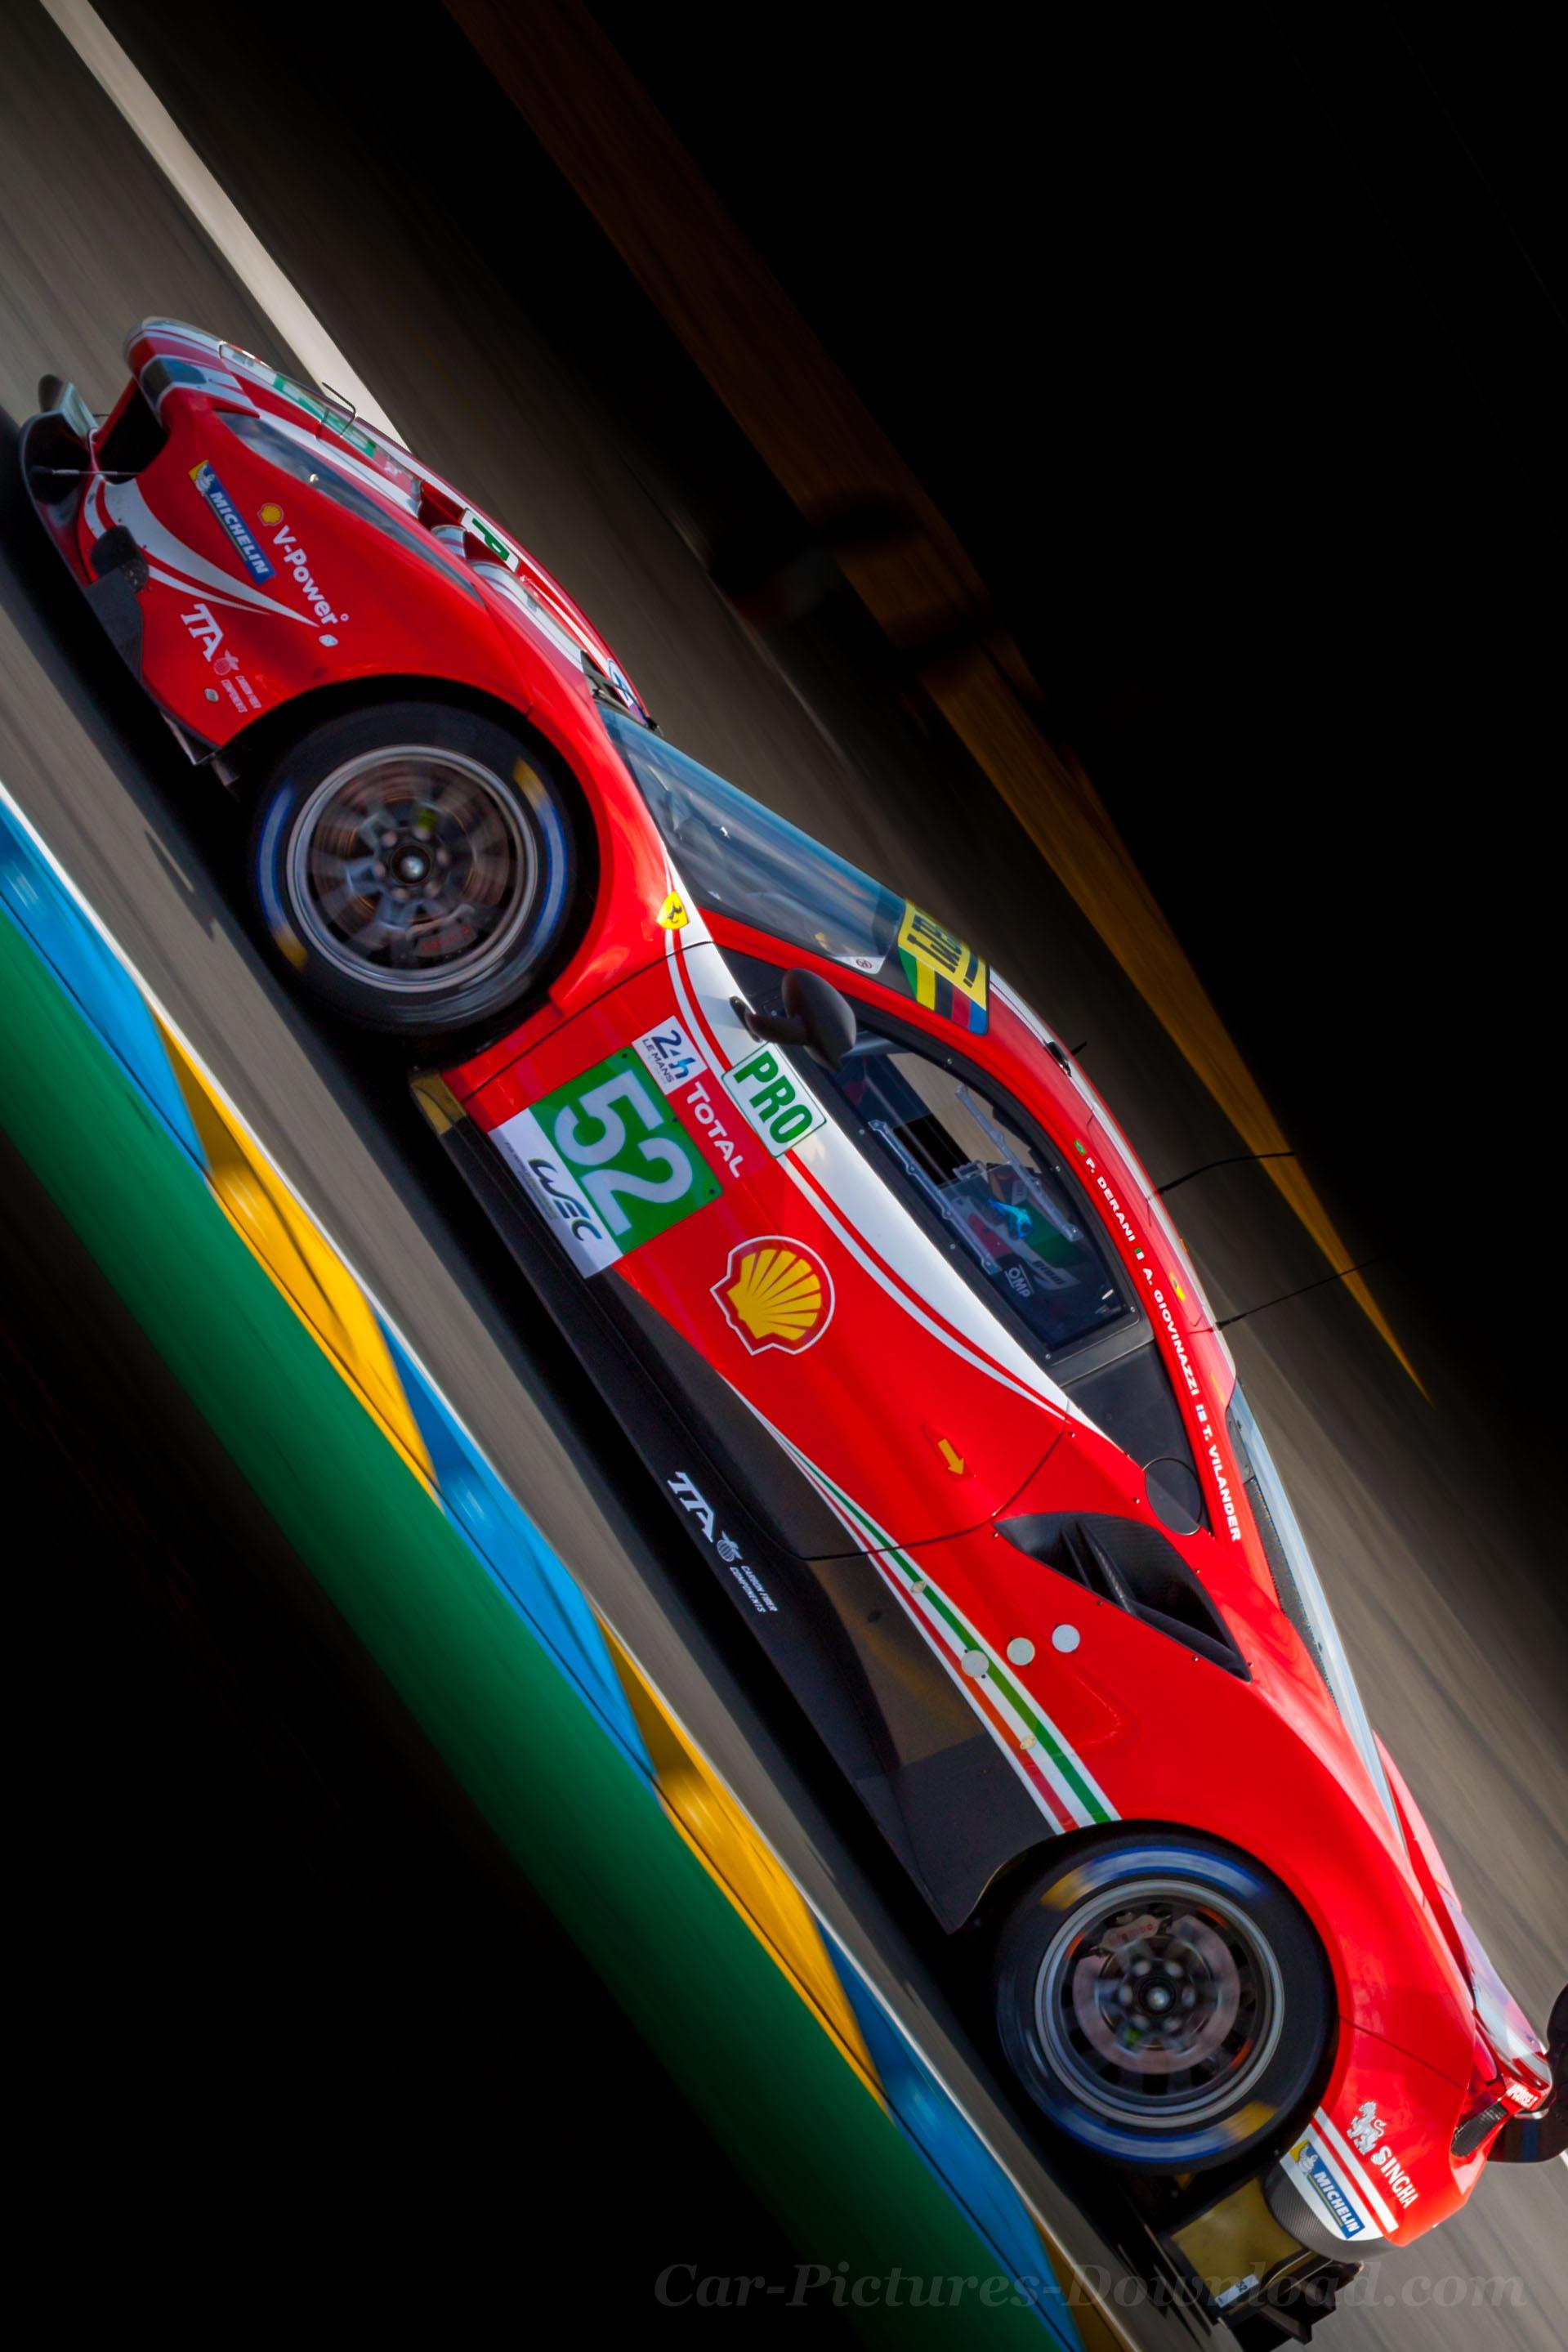 Race Car Wallpaper Iphone 1919x2878 Wallpaper Teahub Io